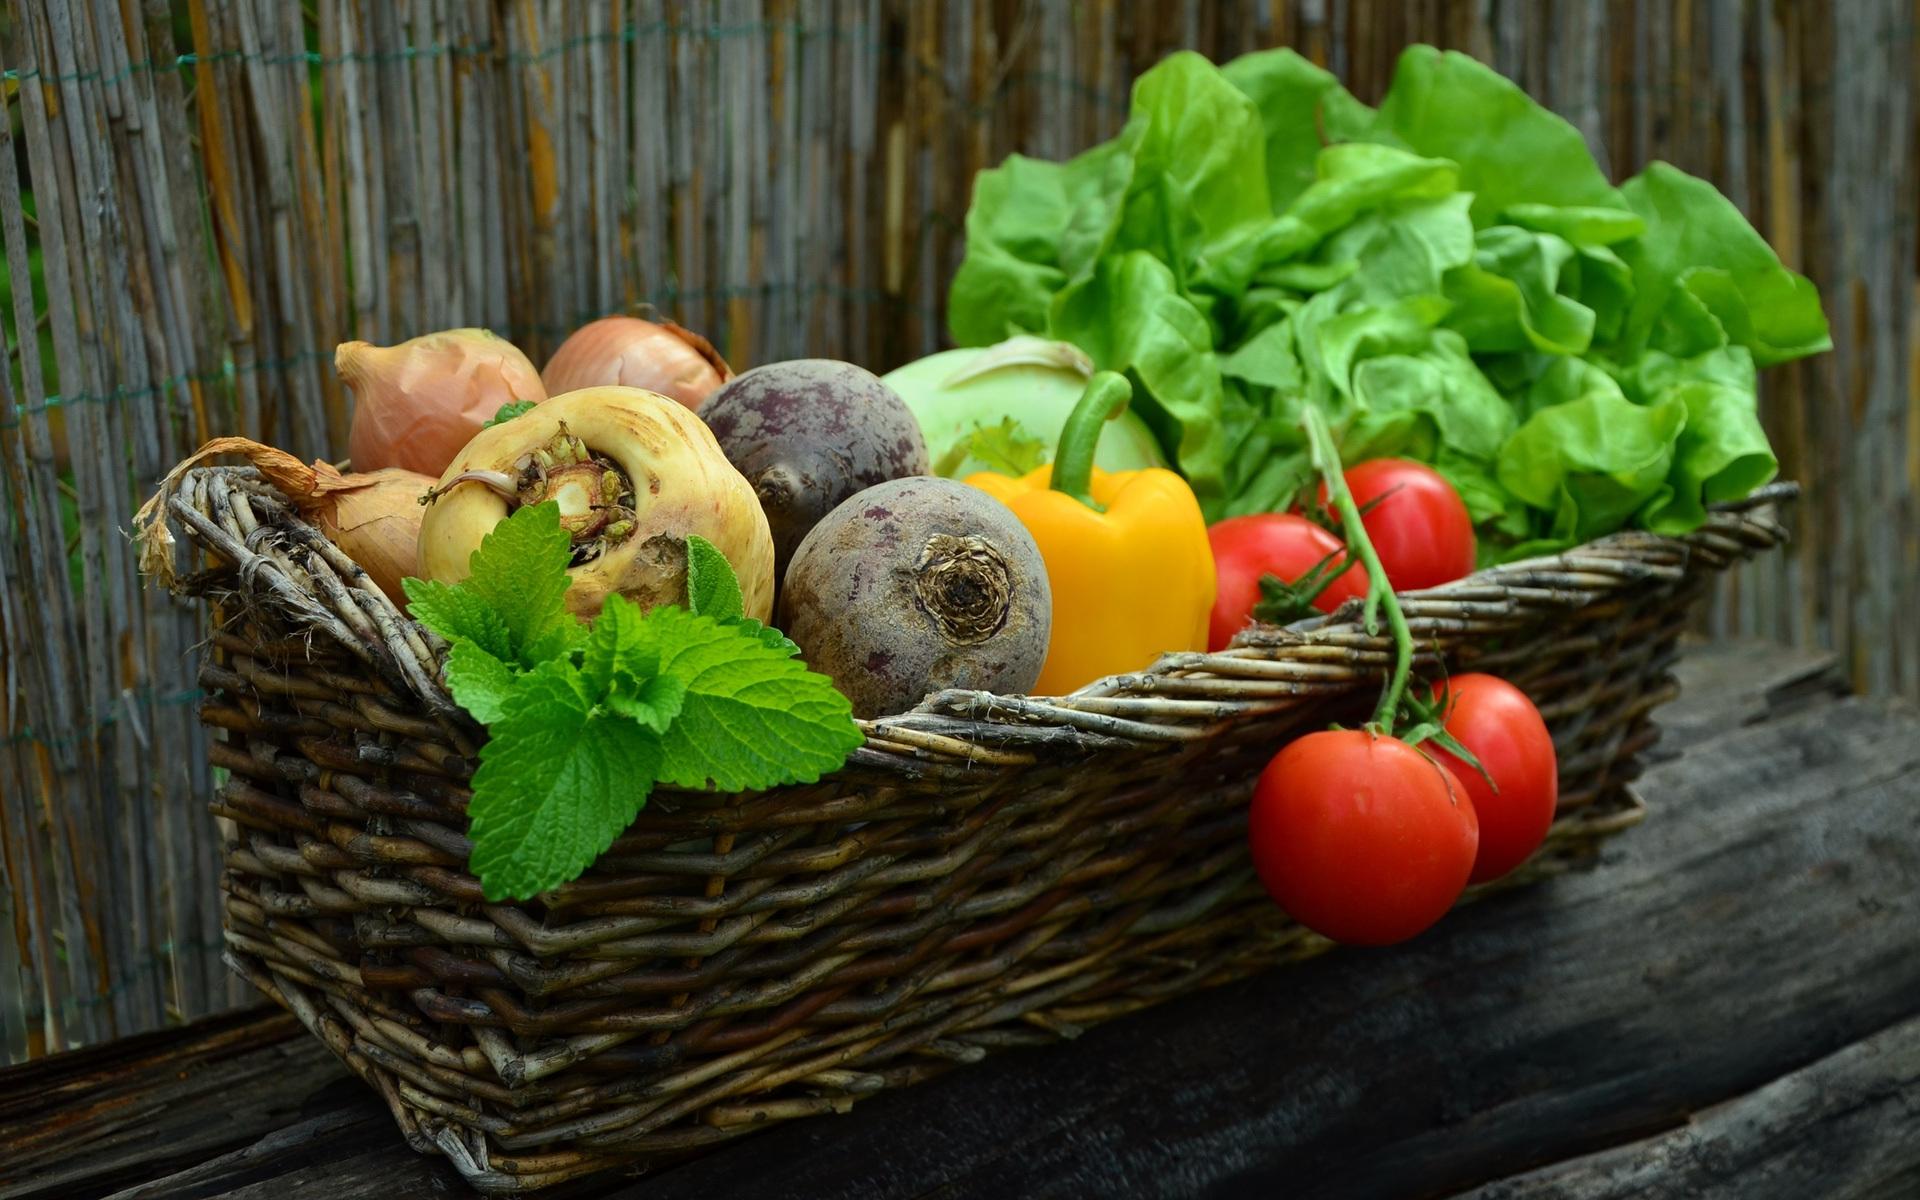 Obst Gemüse Markt Korb